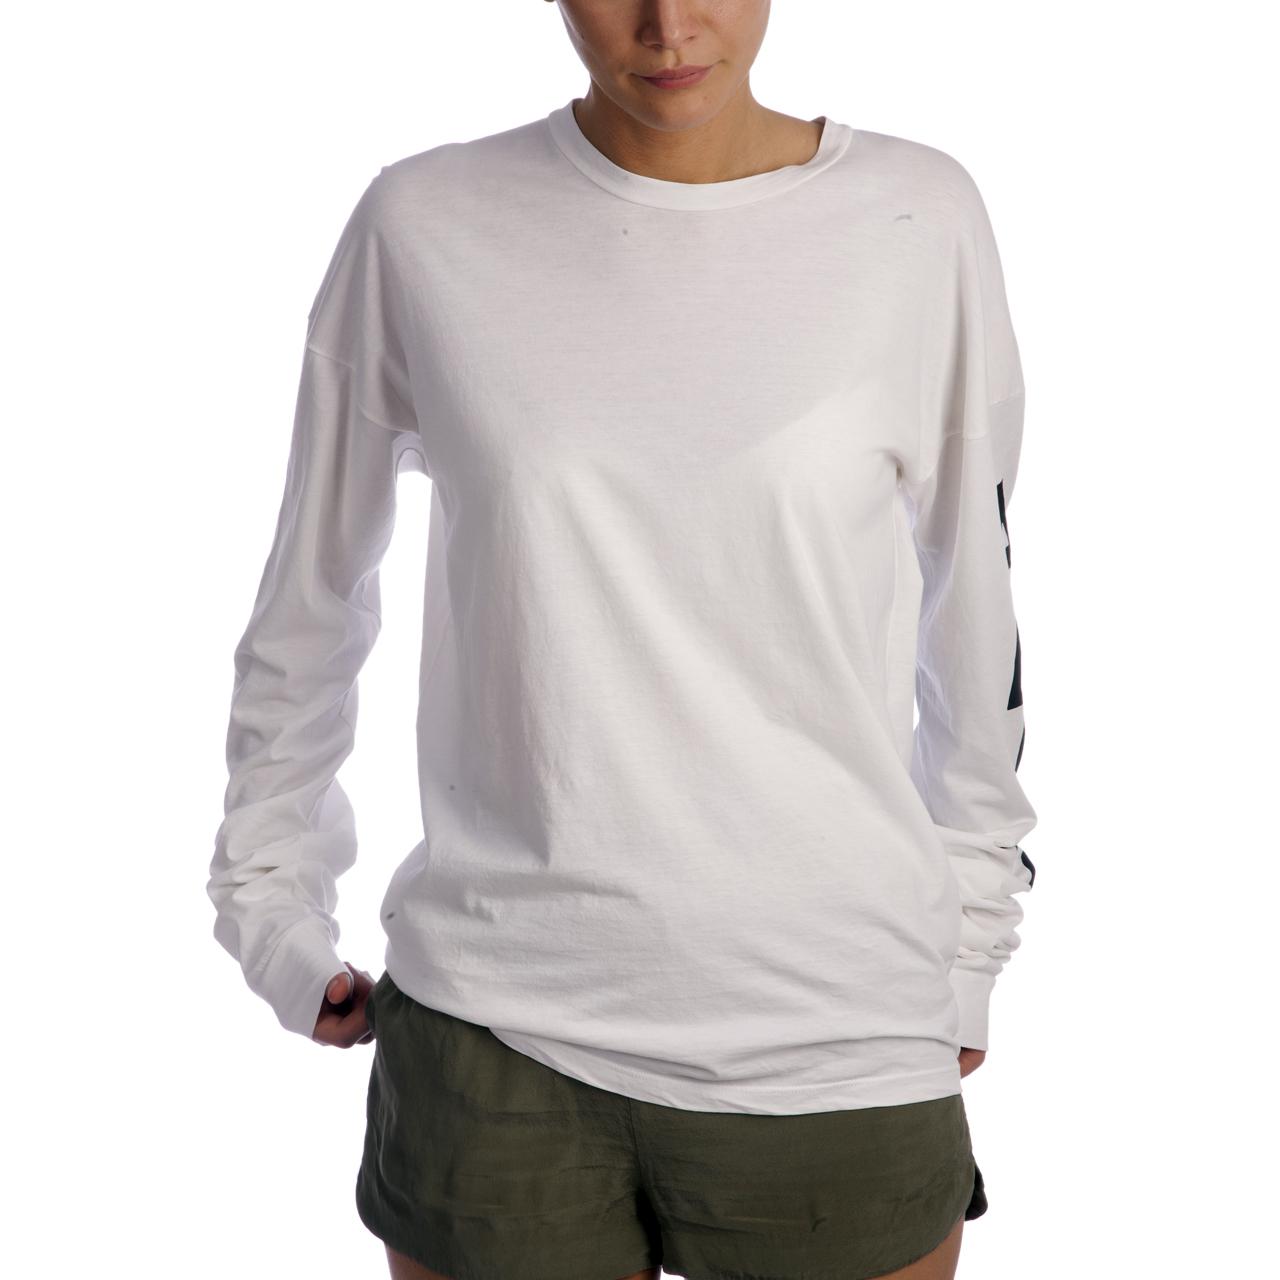 Aries Pyramid Longsleeve Shirt (Weiß)